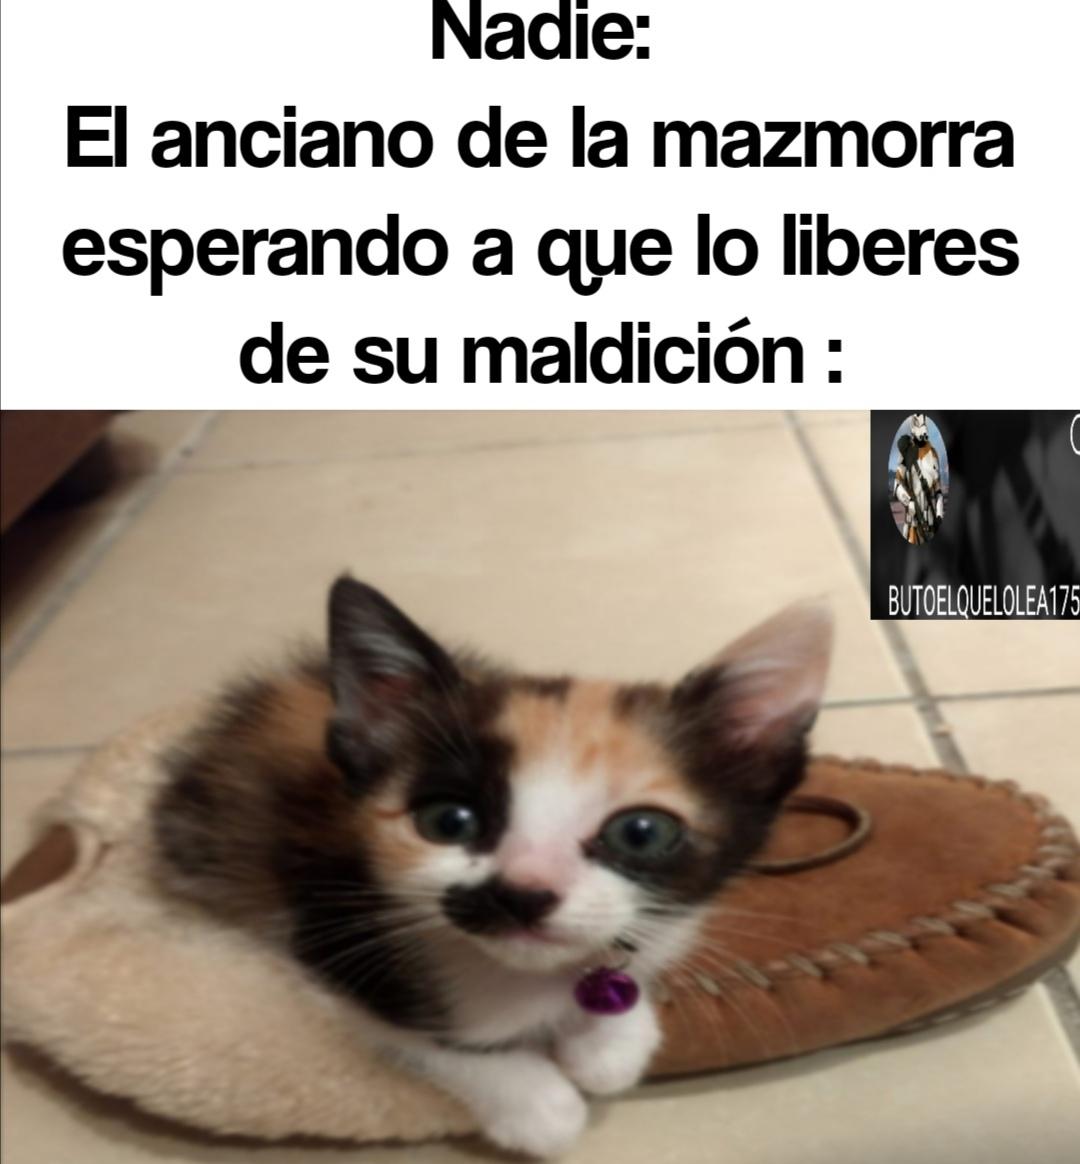 Terraria meme awww que lindo gatito :socute: